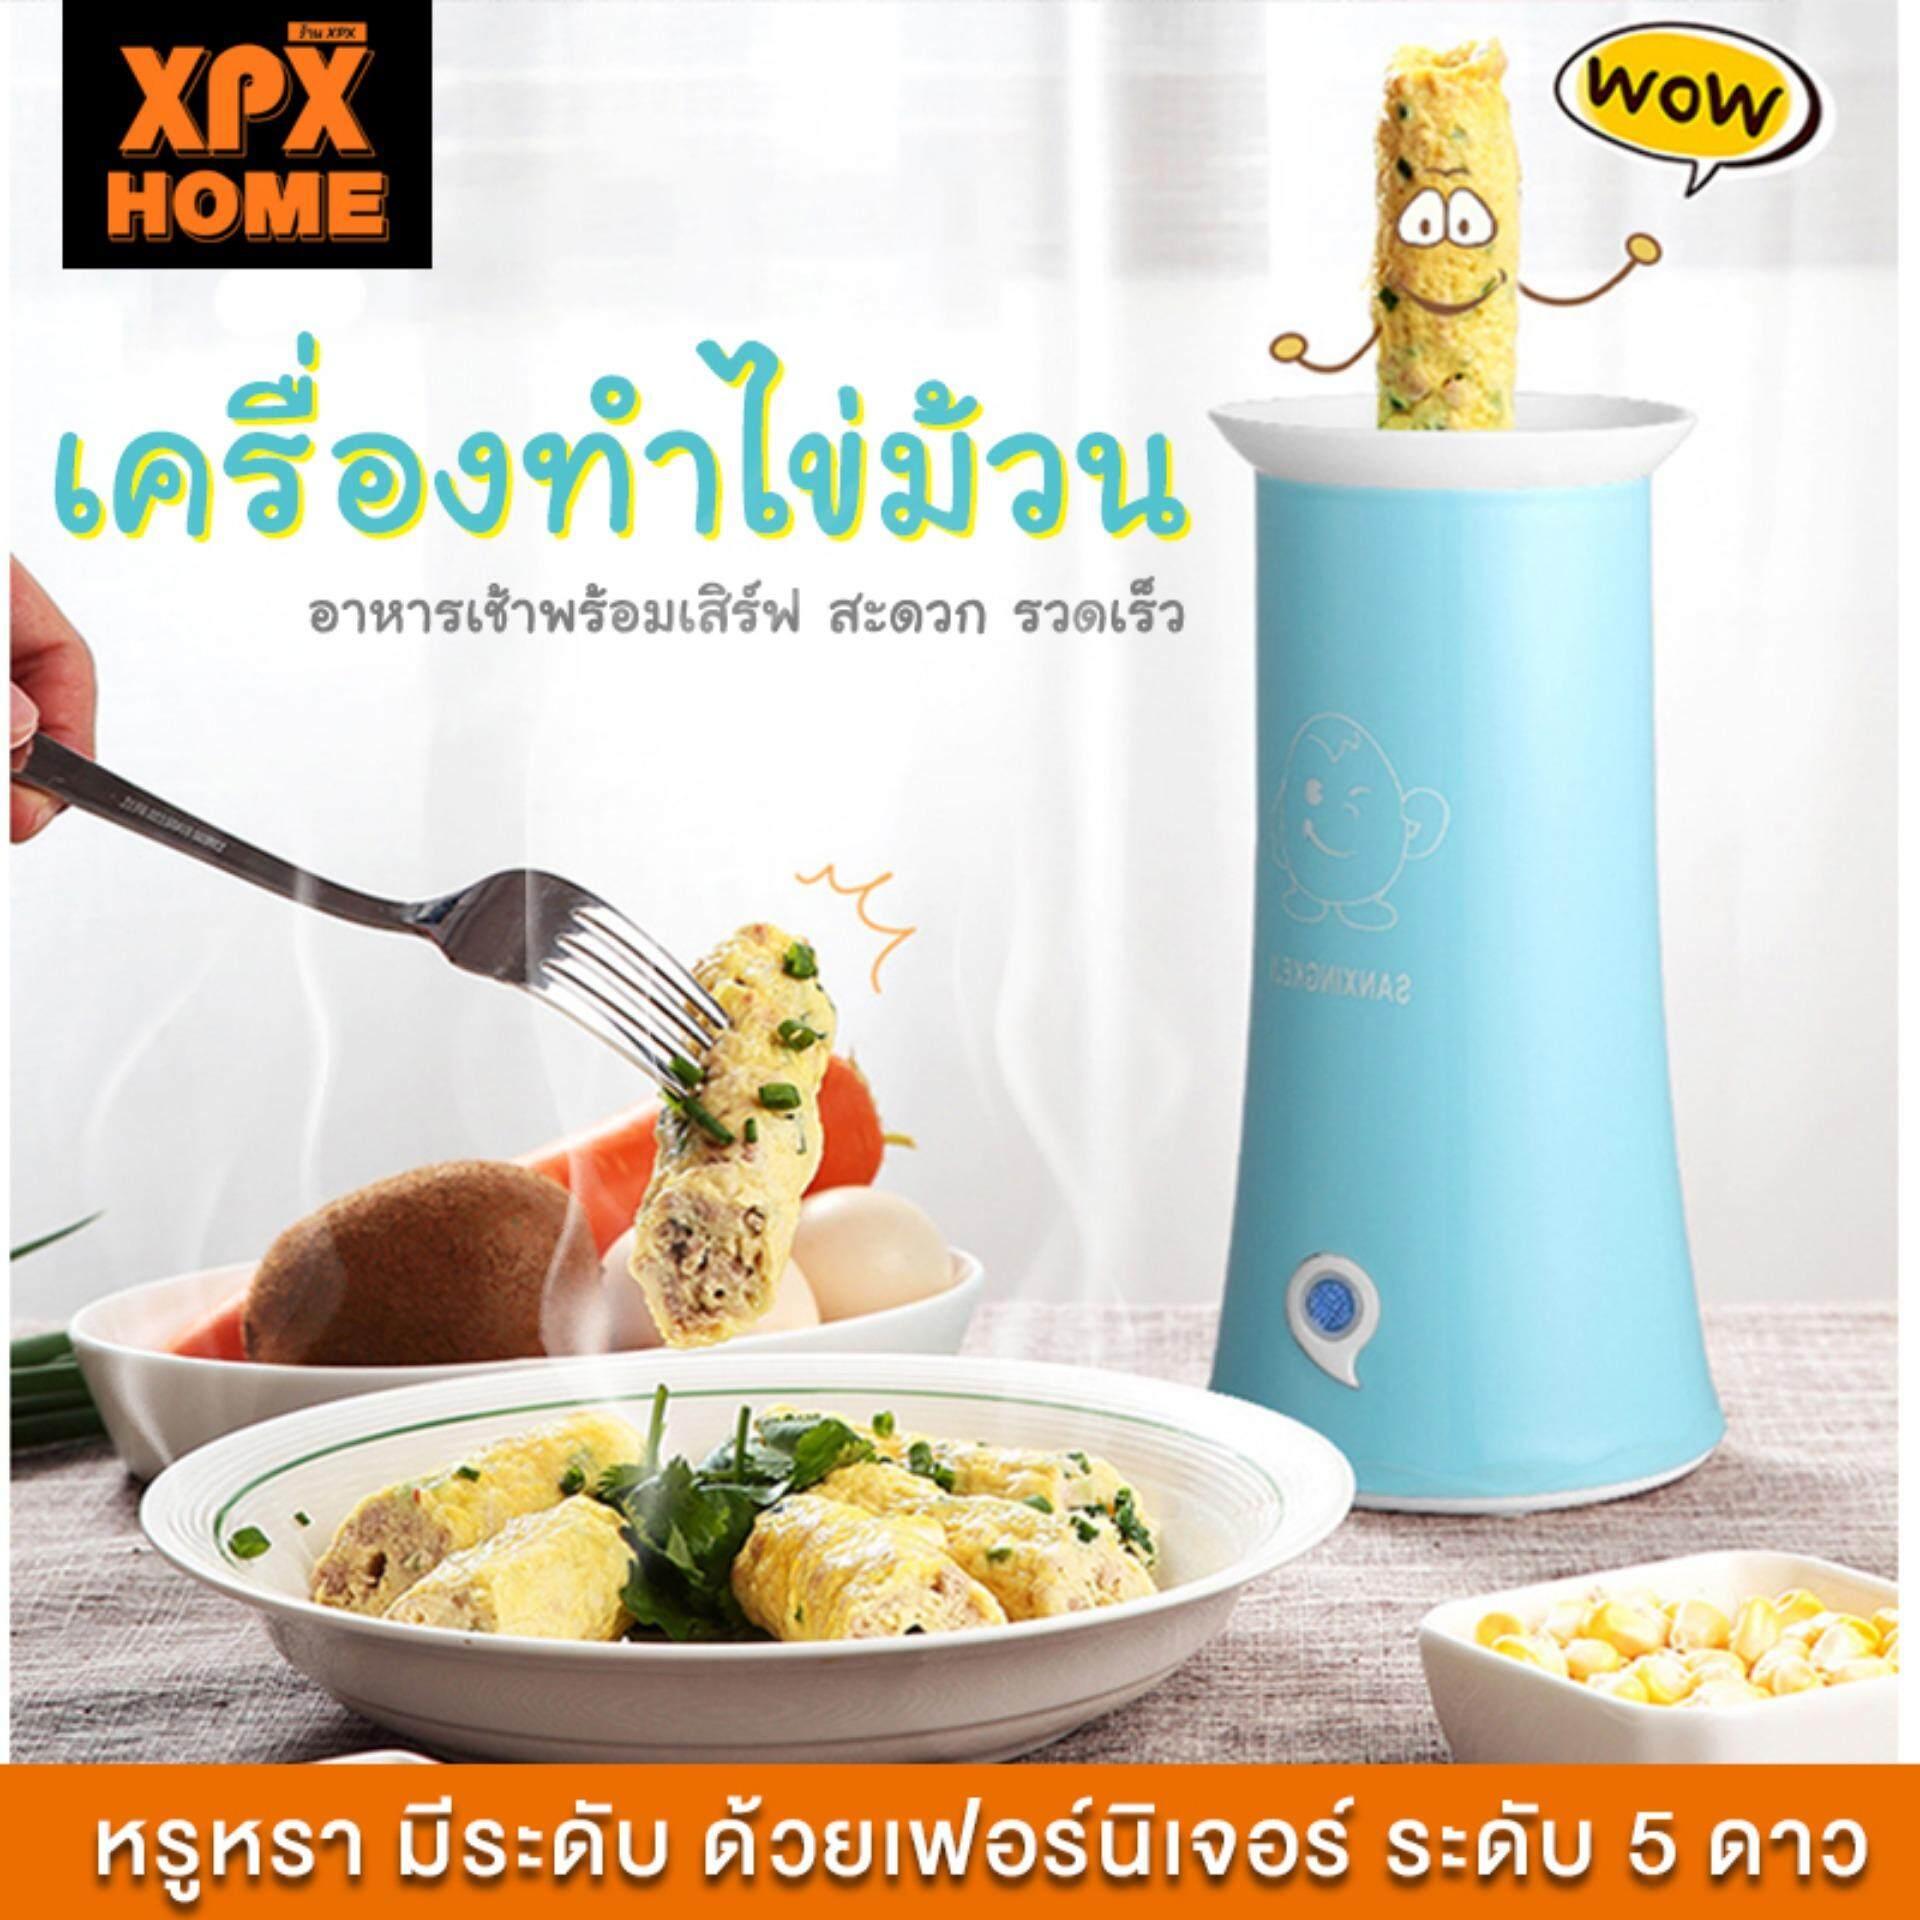 Xpx เครื่องทำไข่ม้วน เครื่องม้วนไข่ เมนูไข่ อาหารเช้า Jd52 By Xpx Home Official Store.